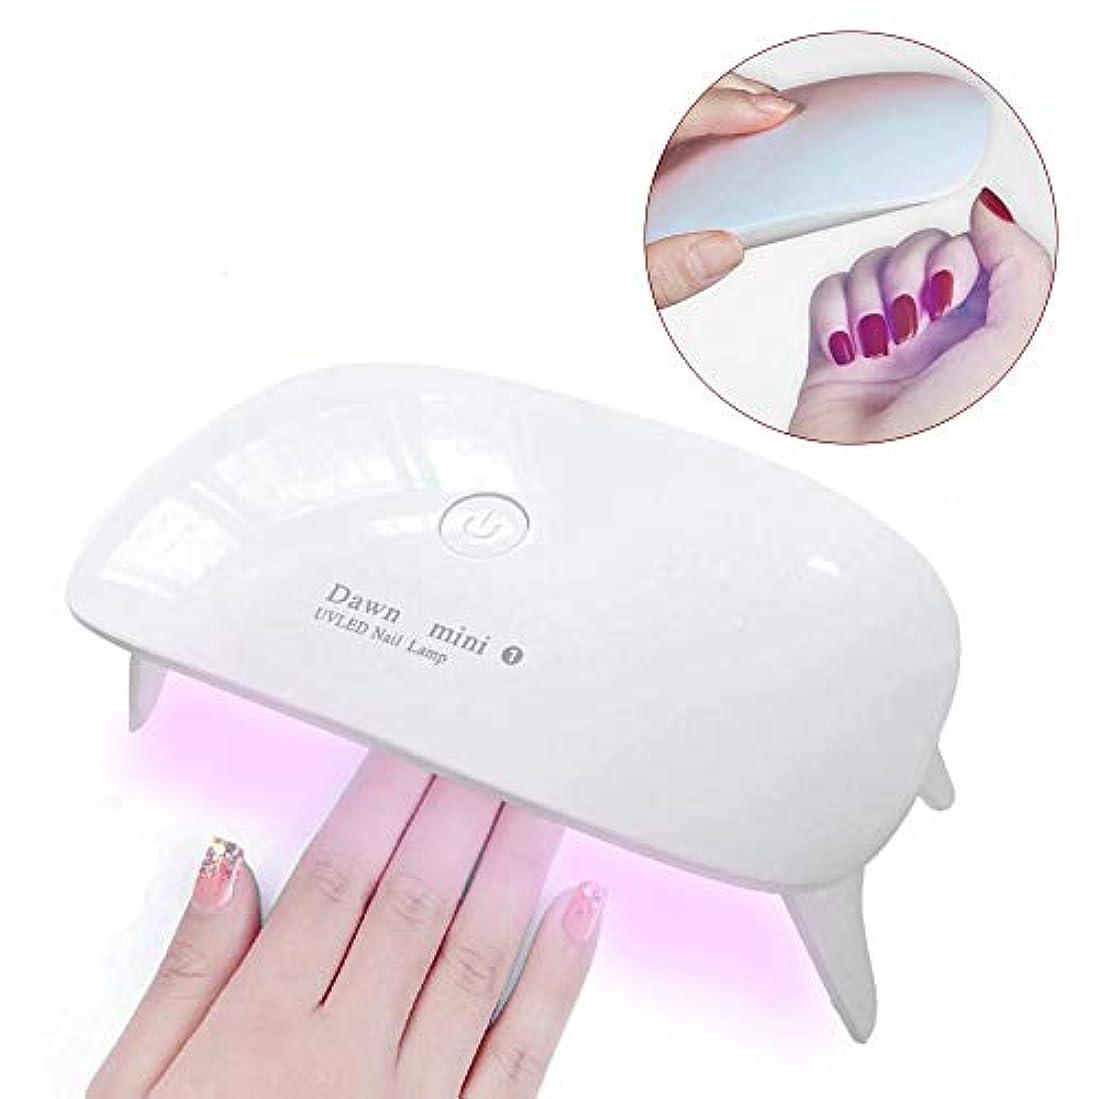 UVライト LEDネイルドライヤー 硬化ライト レジン用 日本語取扱説明書付 タイマー設定可能 折りたたみ式 手と足両用 UVとLEDダブルライト ジェルネイル レジンクラフト用